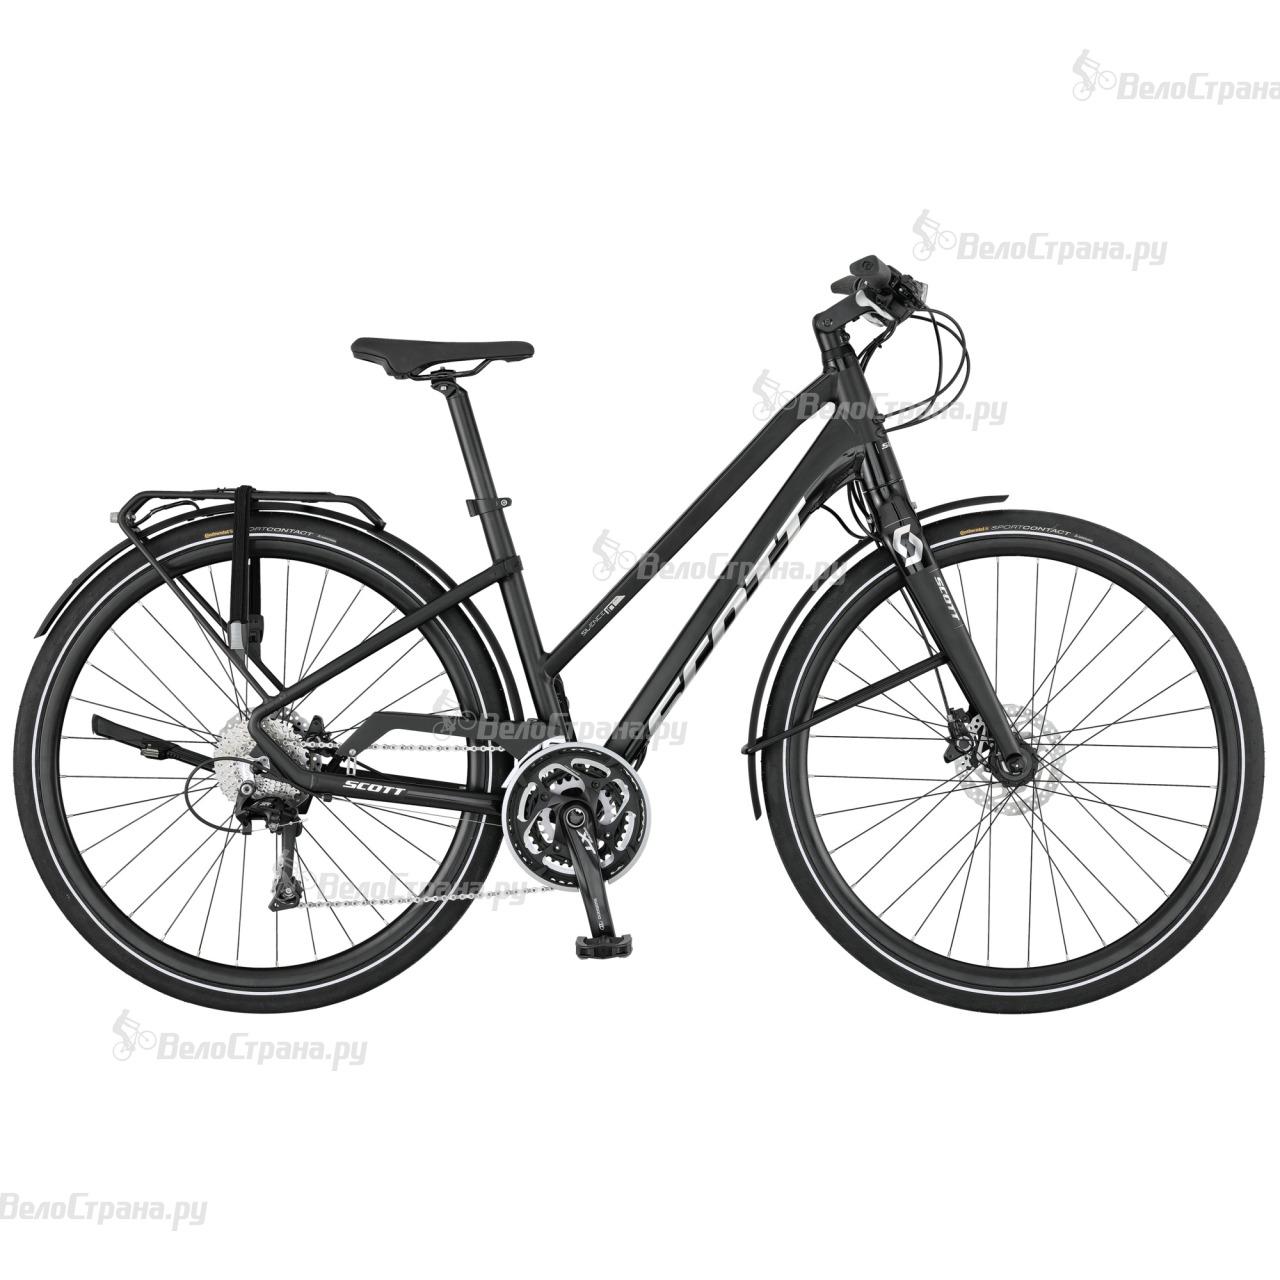 Велосипед Scott Silence 10 Lady (2017) велосипед scott e silence evo 2017